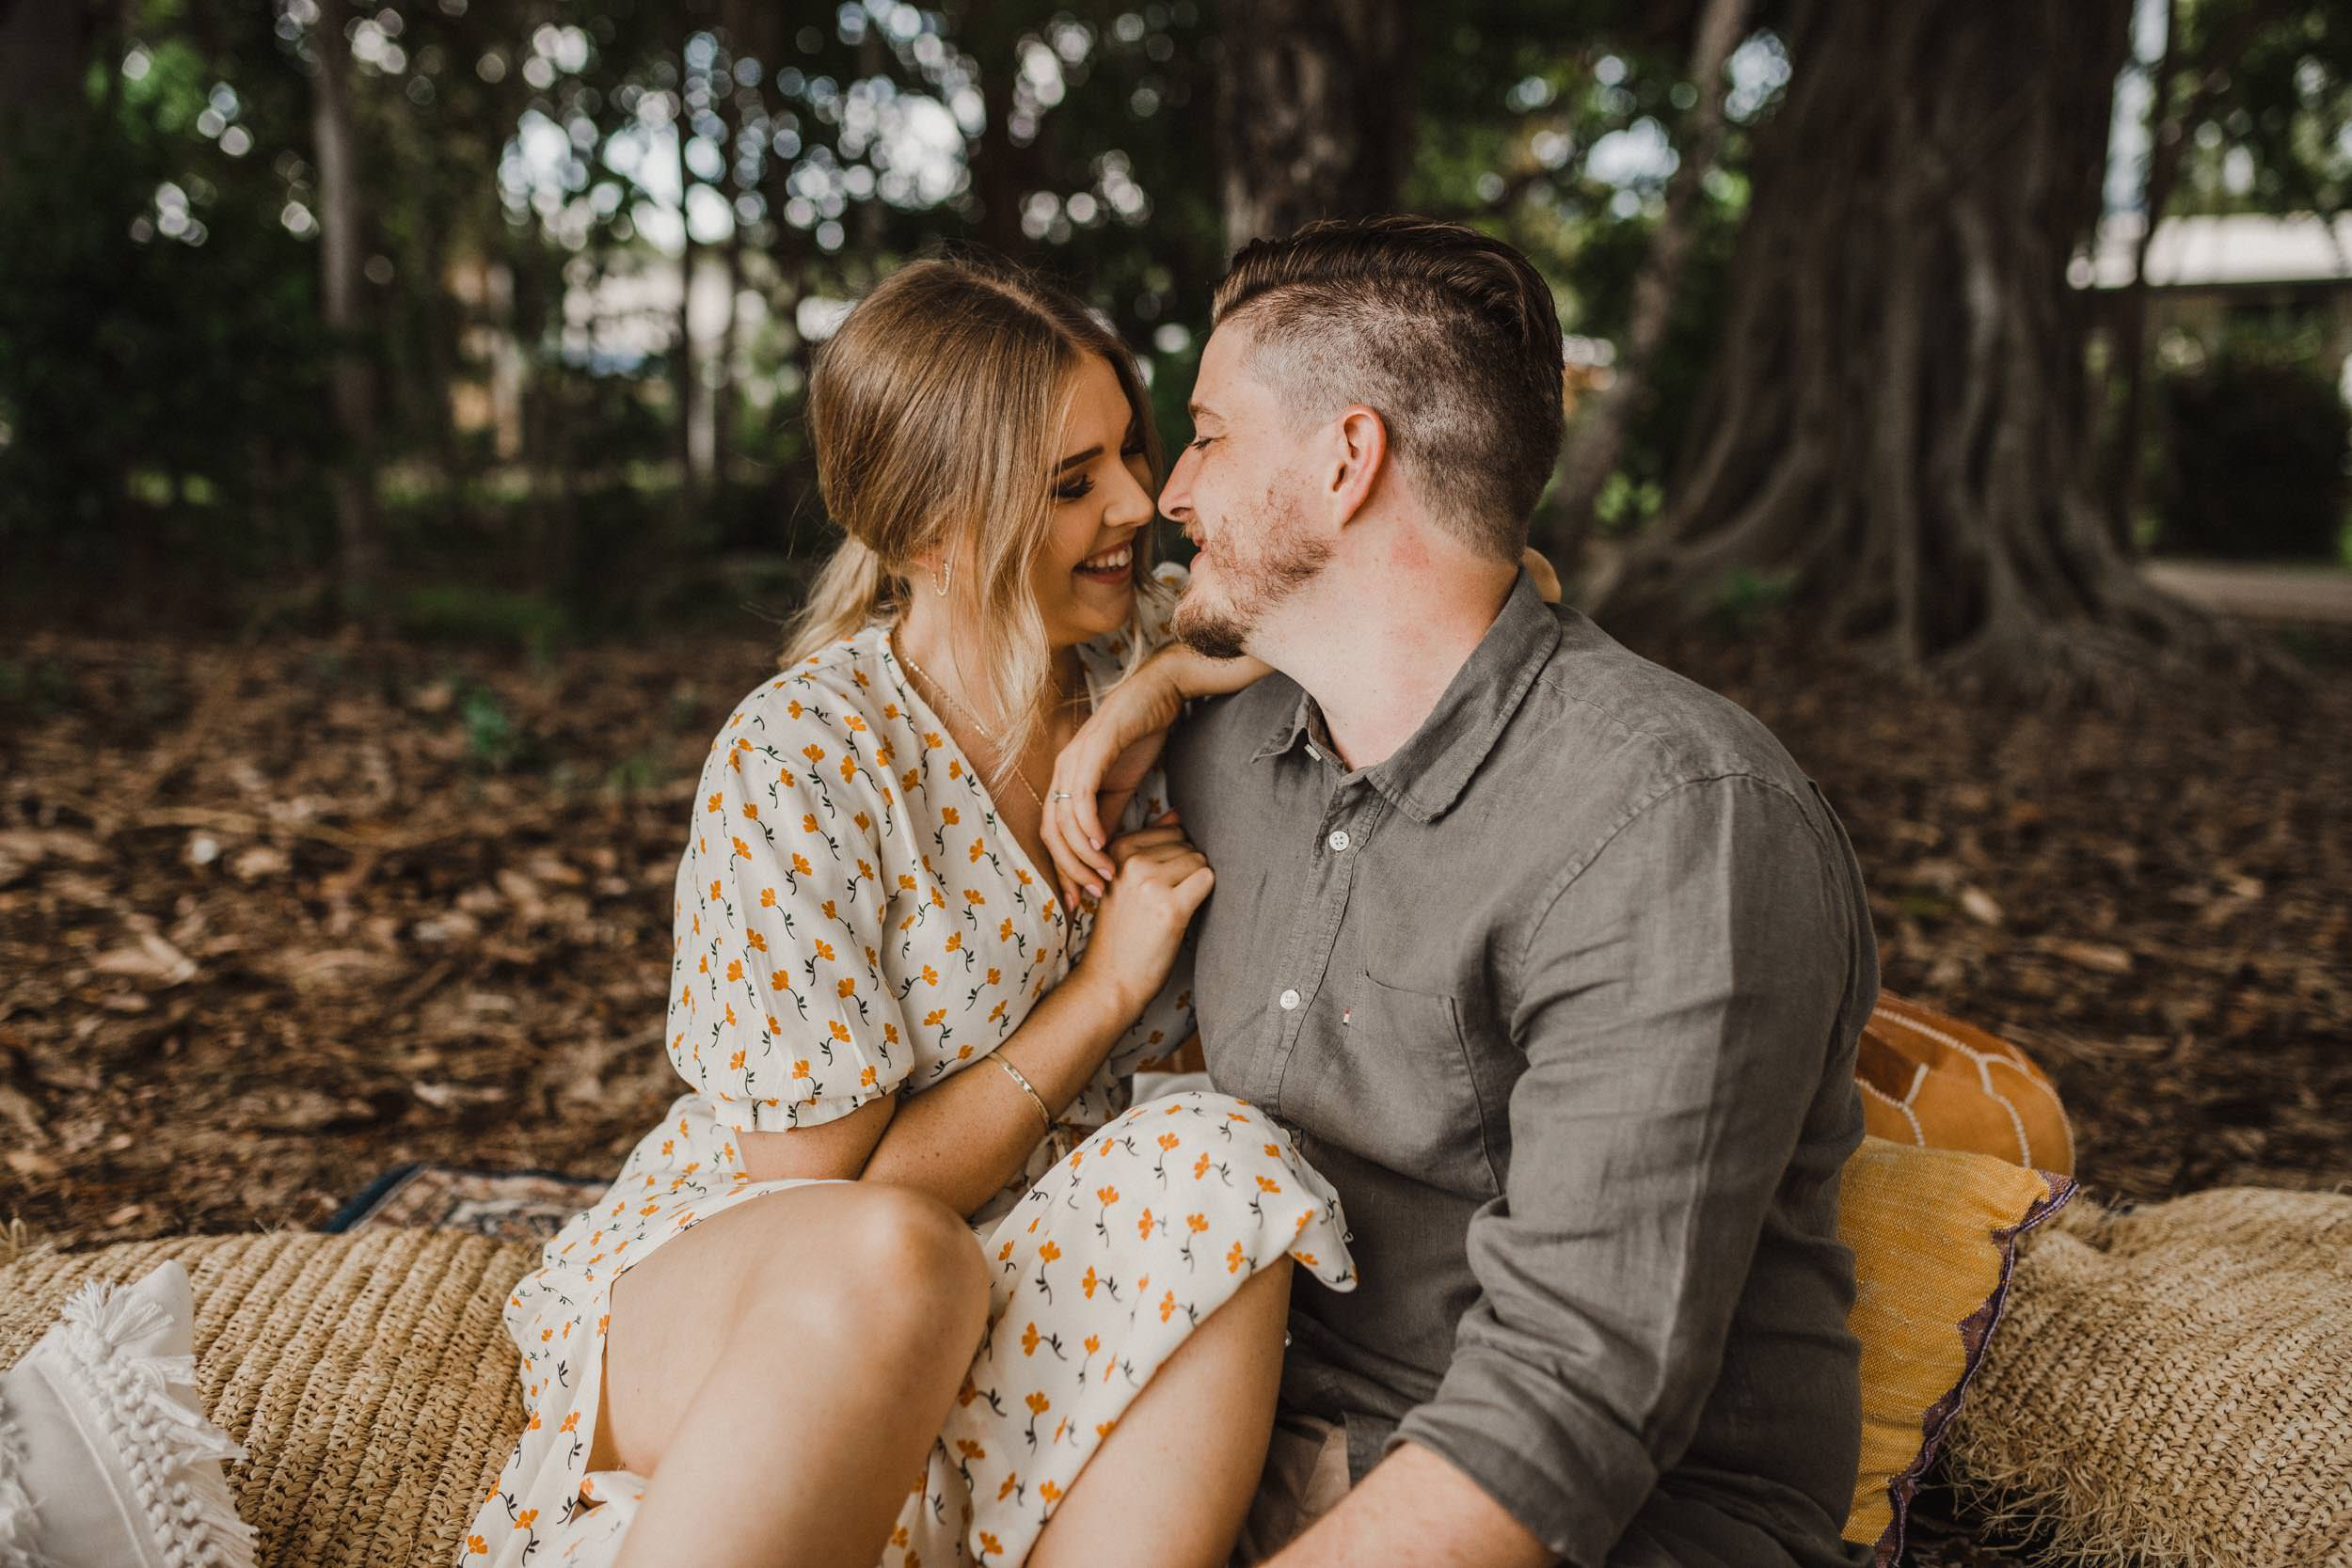 The Raw Photographer - Cairns Wedding Photographer - Beach Engagement Shoot - Candid Picnic-8.jpg